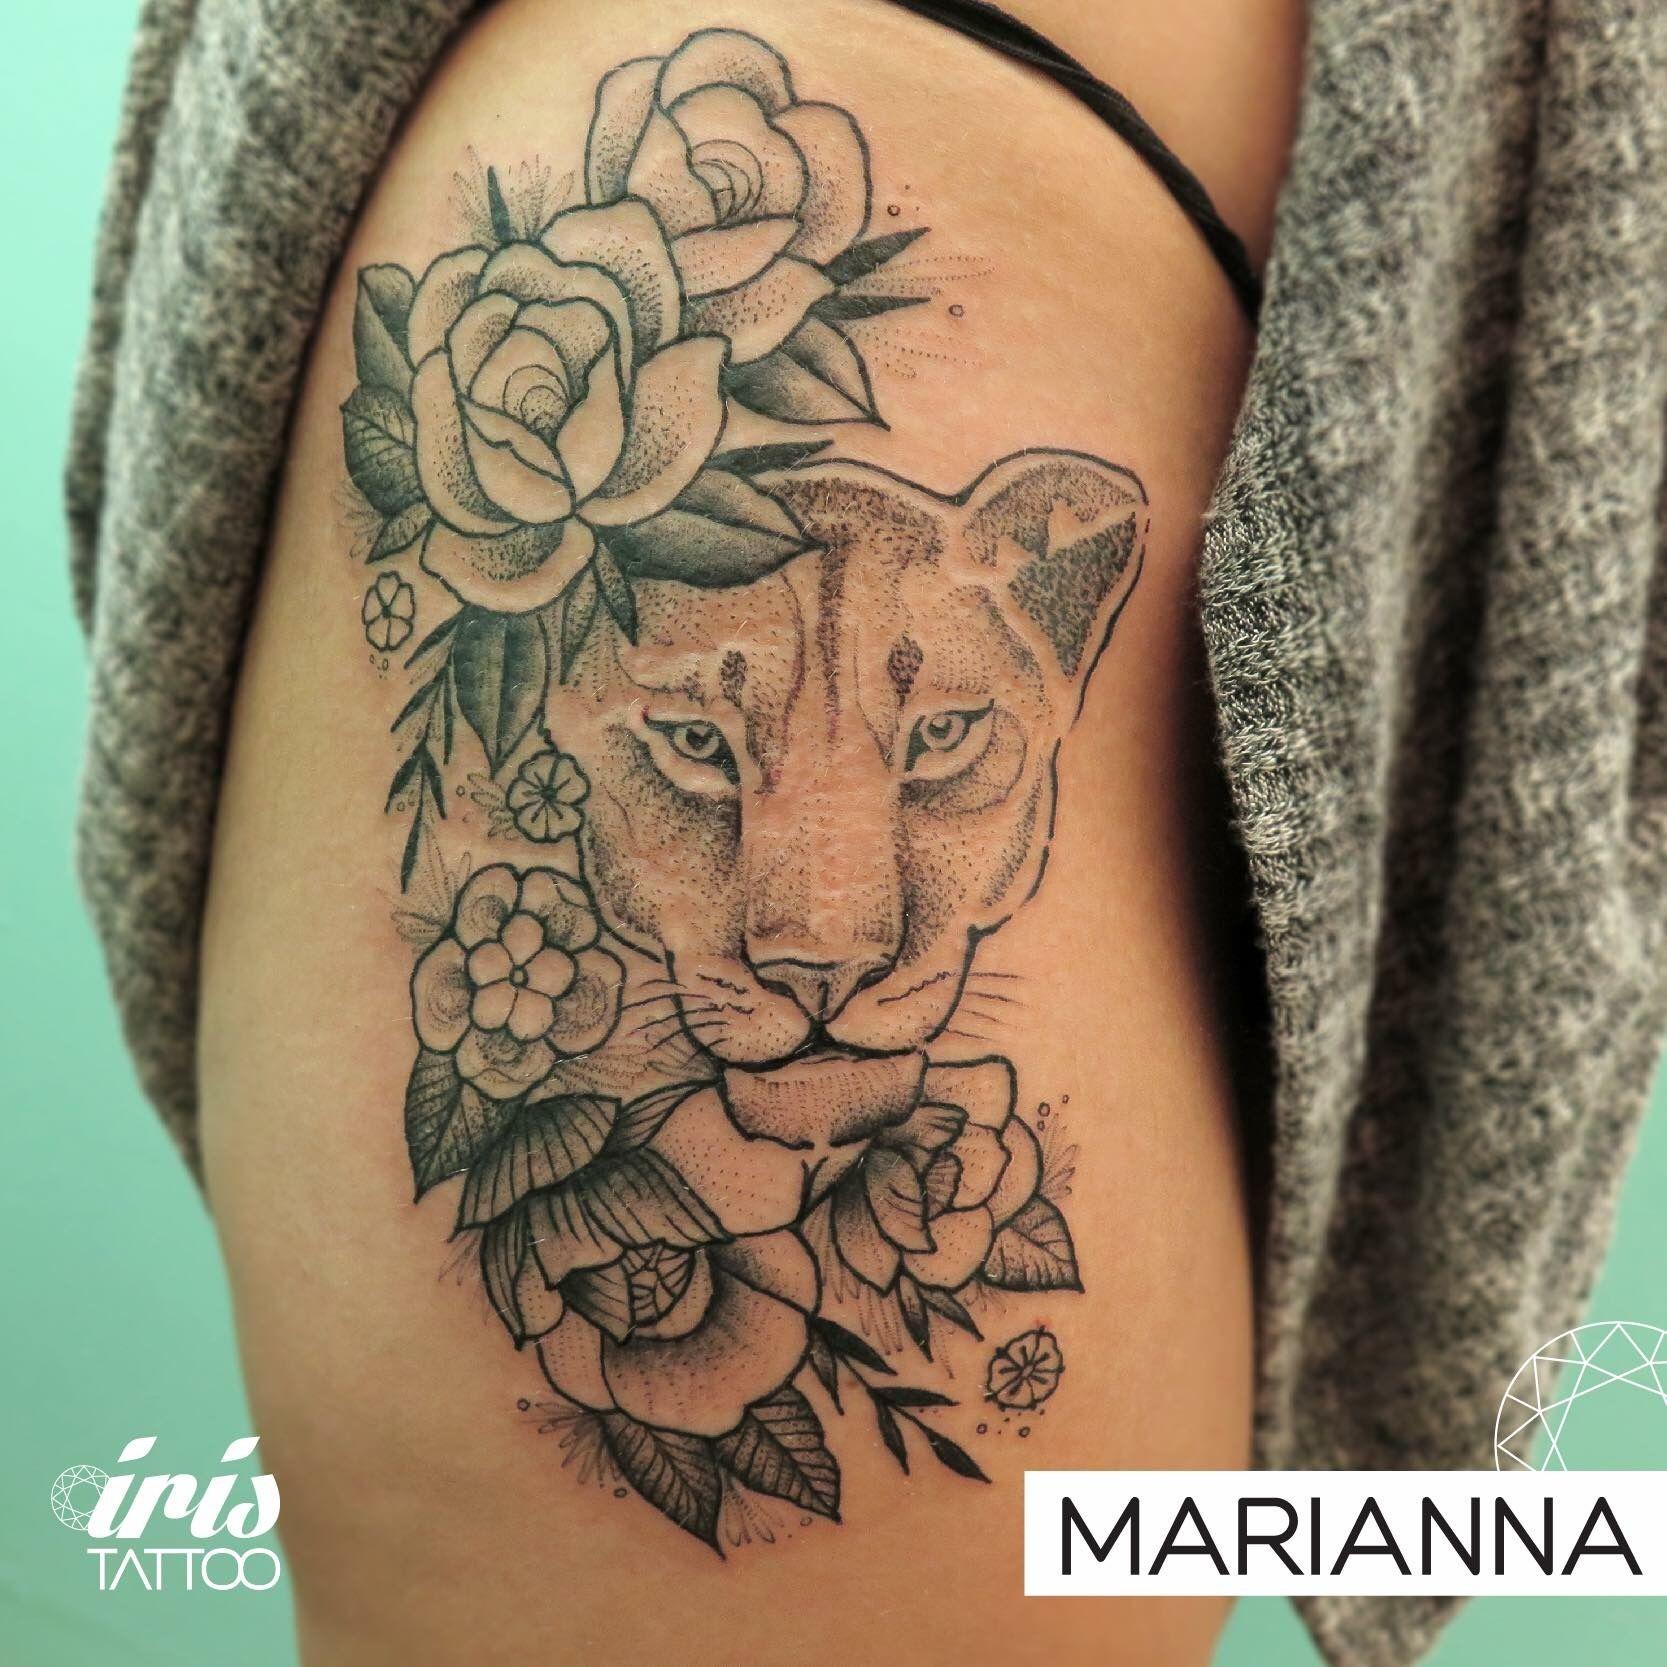 фото татуировок на спине японскими